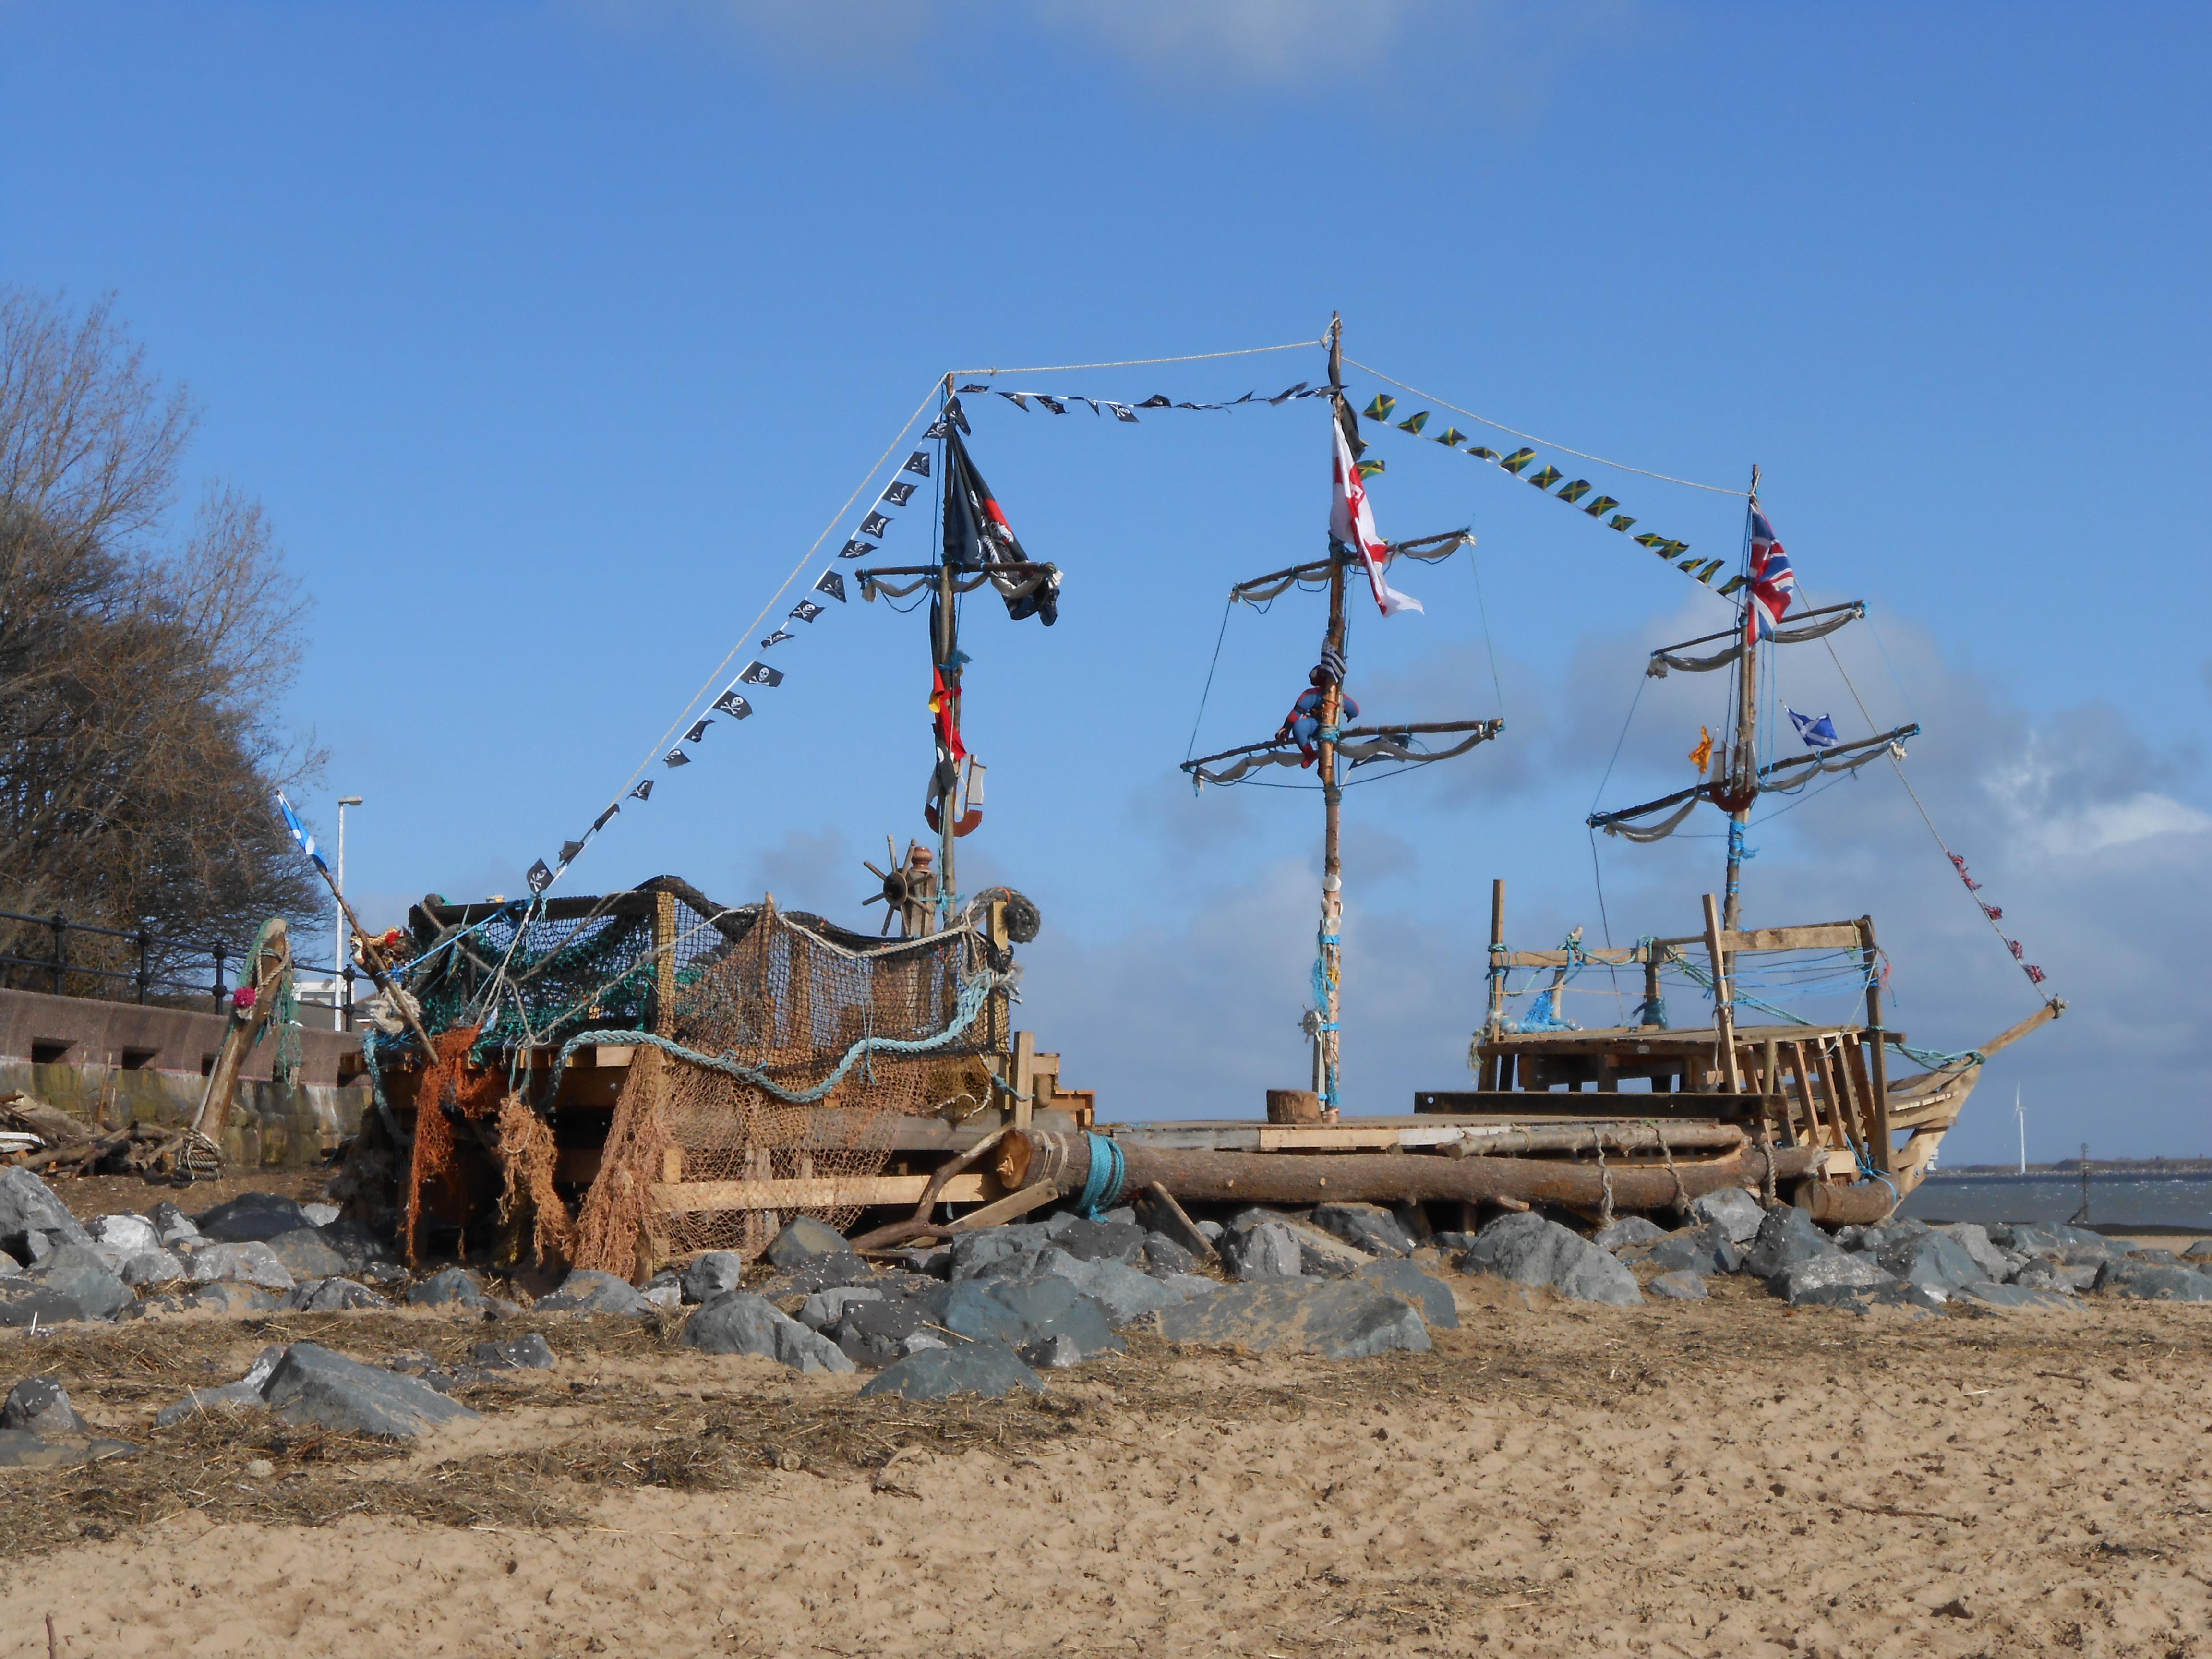 File New Brighton Pirate Ship 1 Jpg